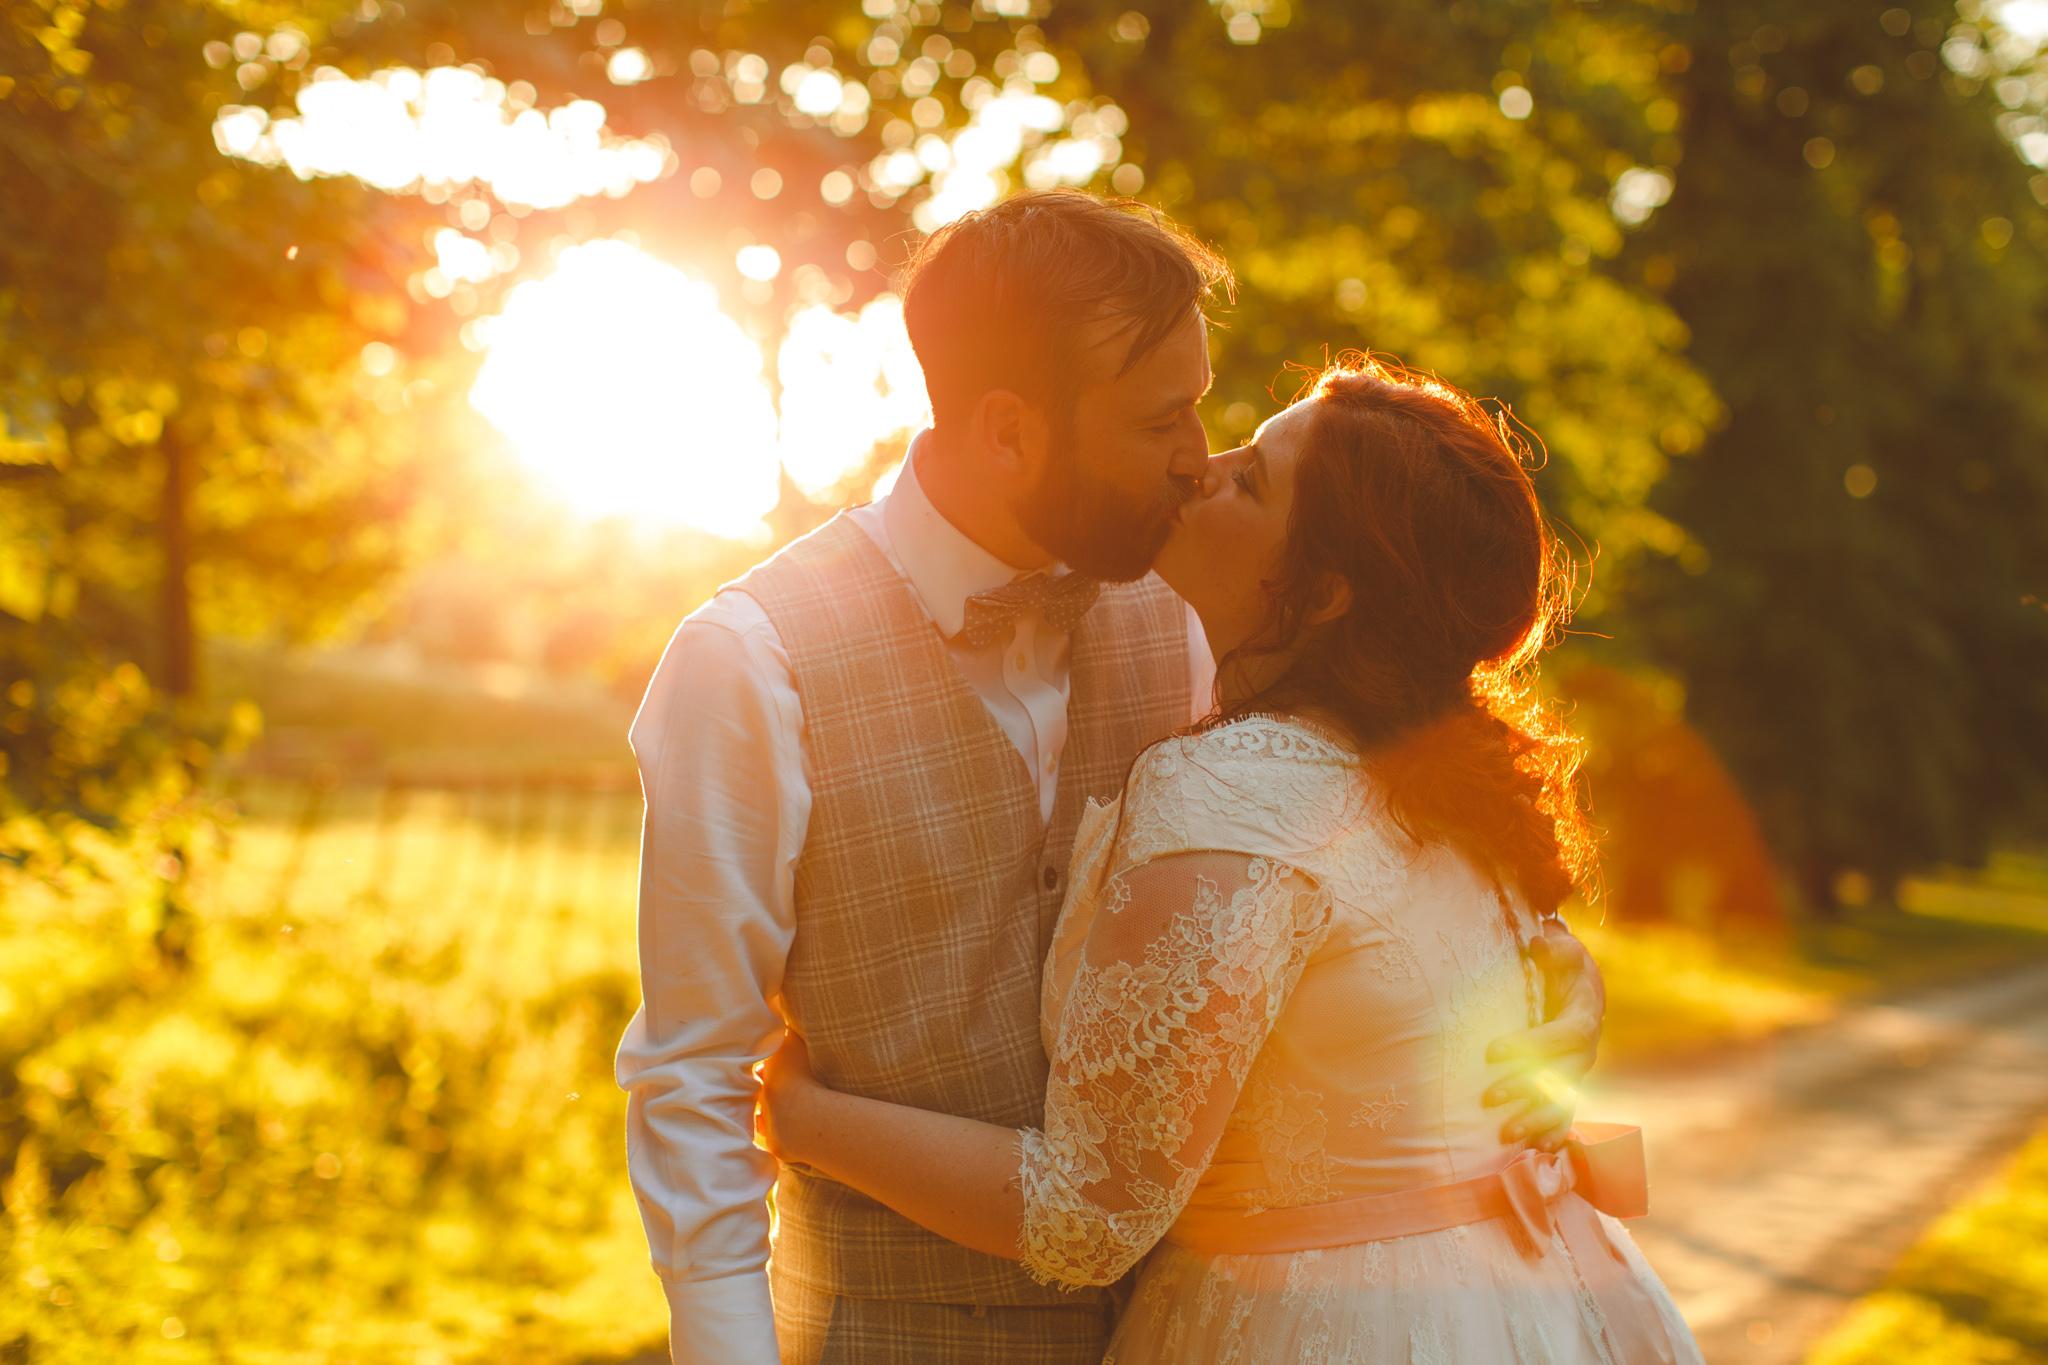 derbyshire-wedding-photographer-videographer-camera-hannah-54.jpg